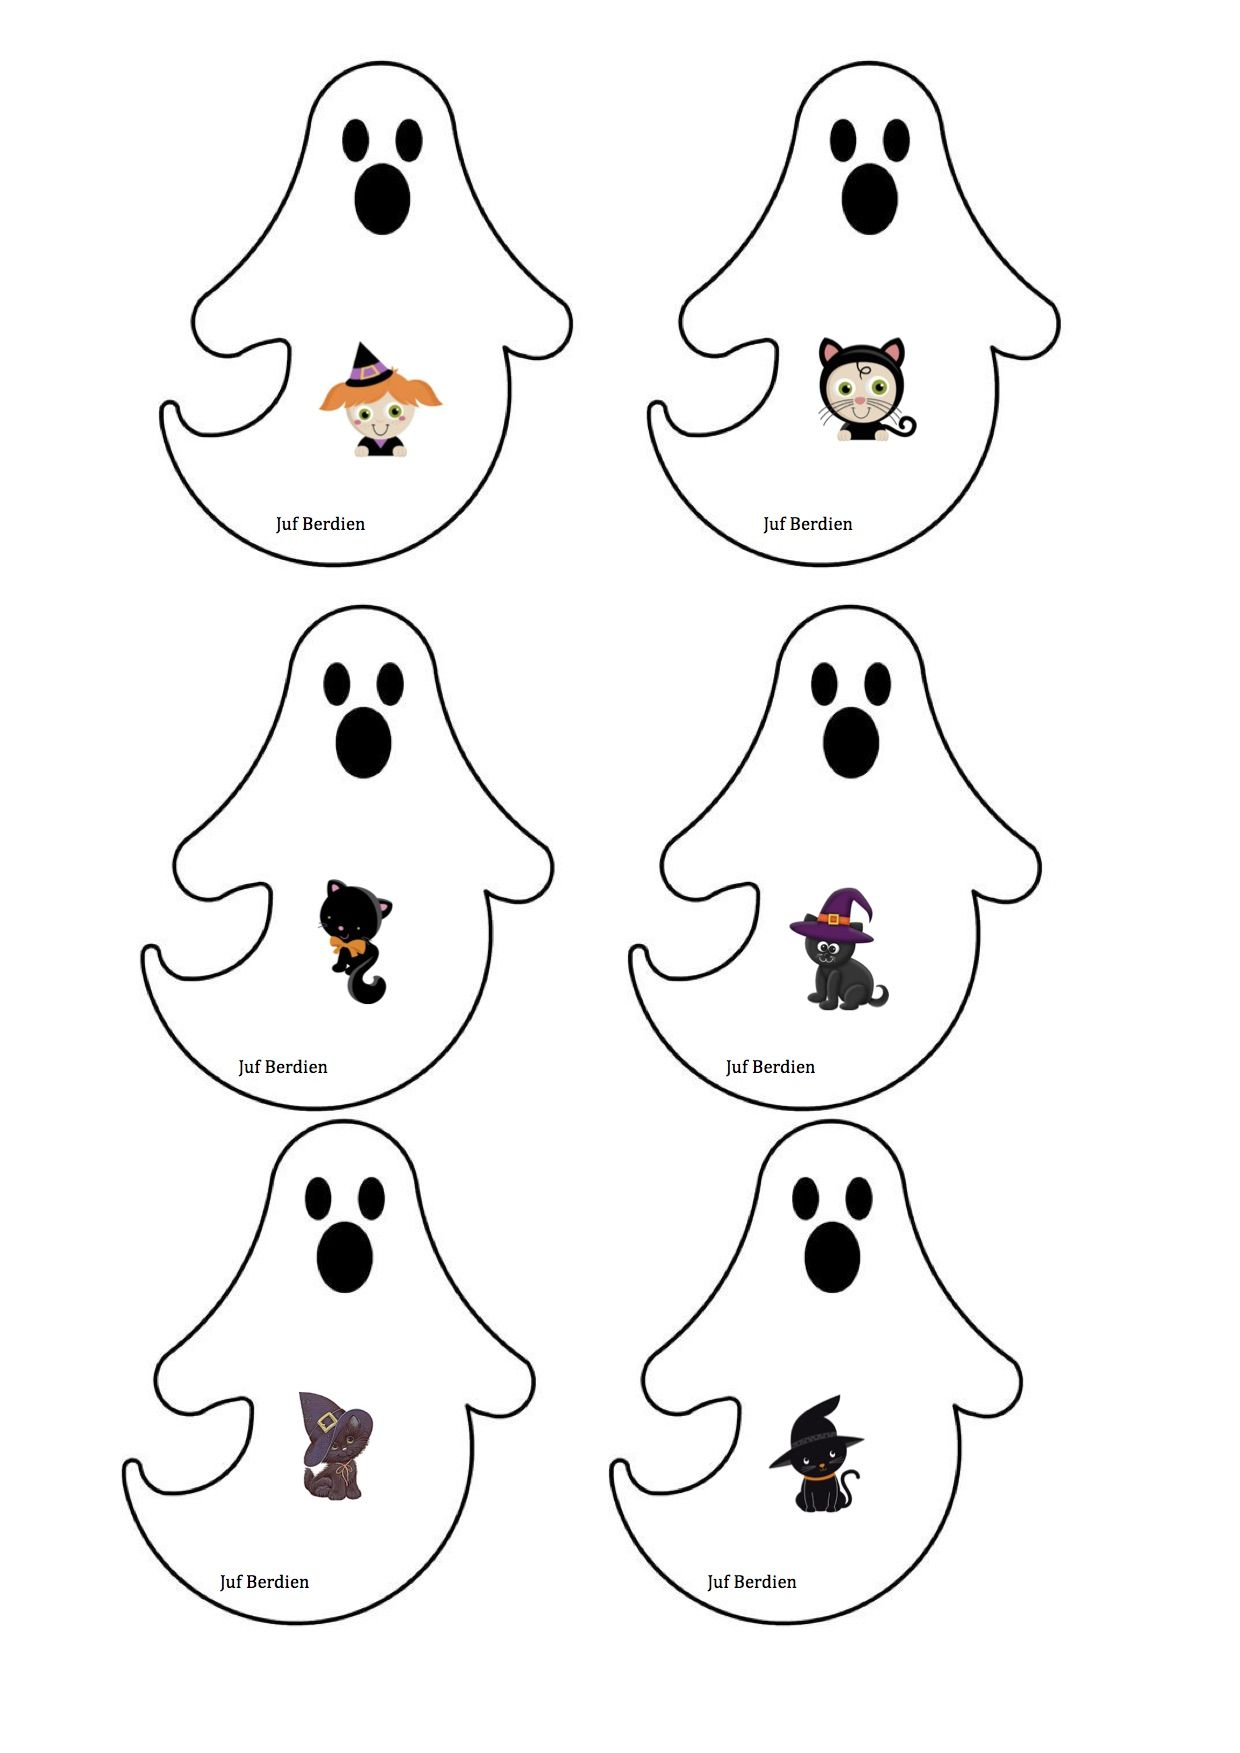 Spookjesspel Juf Berdien 2 Kaartjes Thema Halloween Griezelen Volledige Spel Facebookgroep Juf Berdien Halloween Spelletjes Thema Halloween Activiteiten